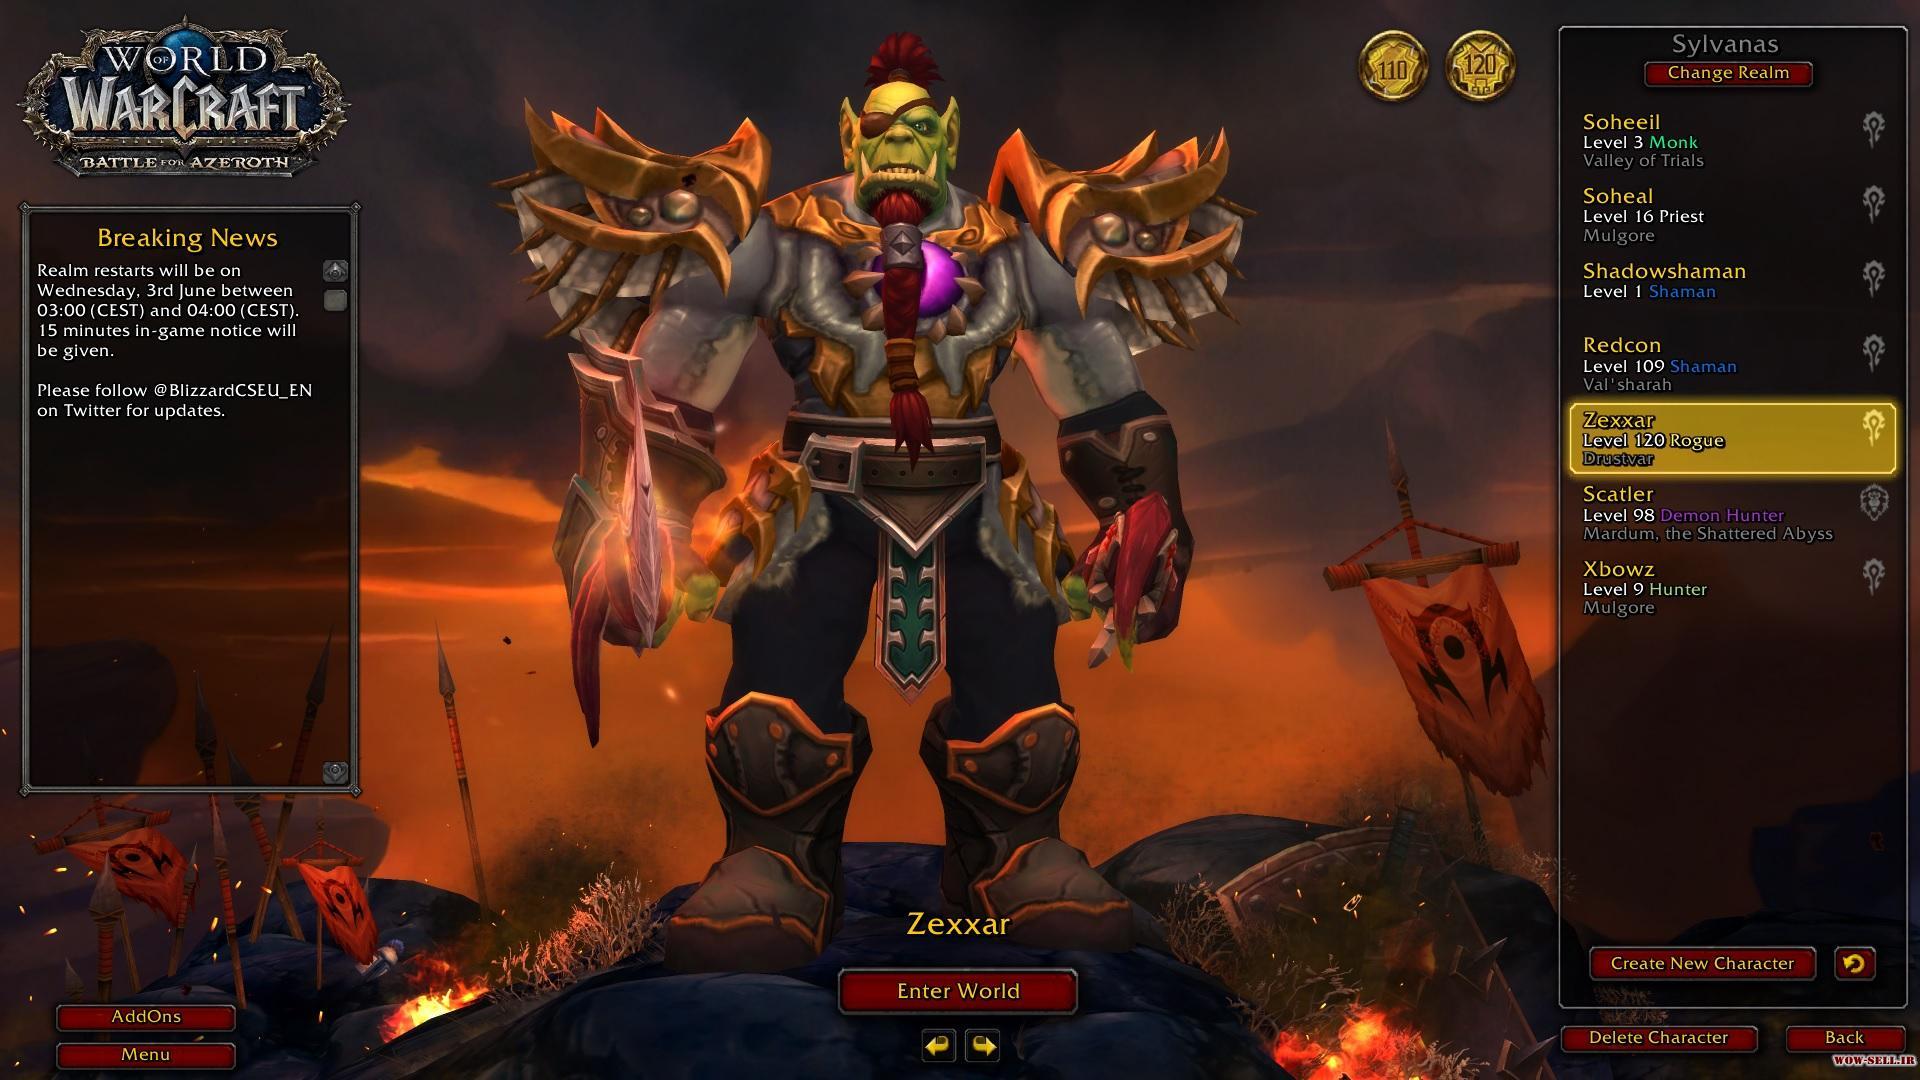 فروش اکانت wow - کد 1121 - کلاس Rouge + shaman - سرور Battle.net